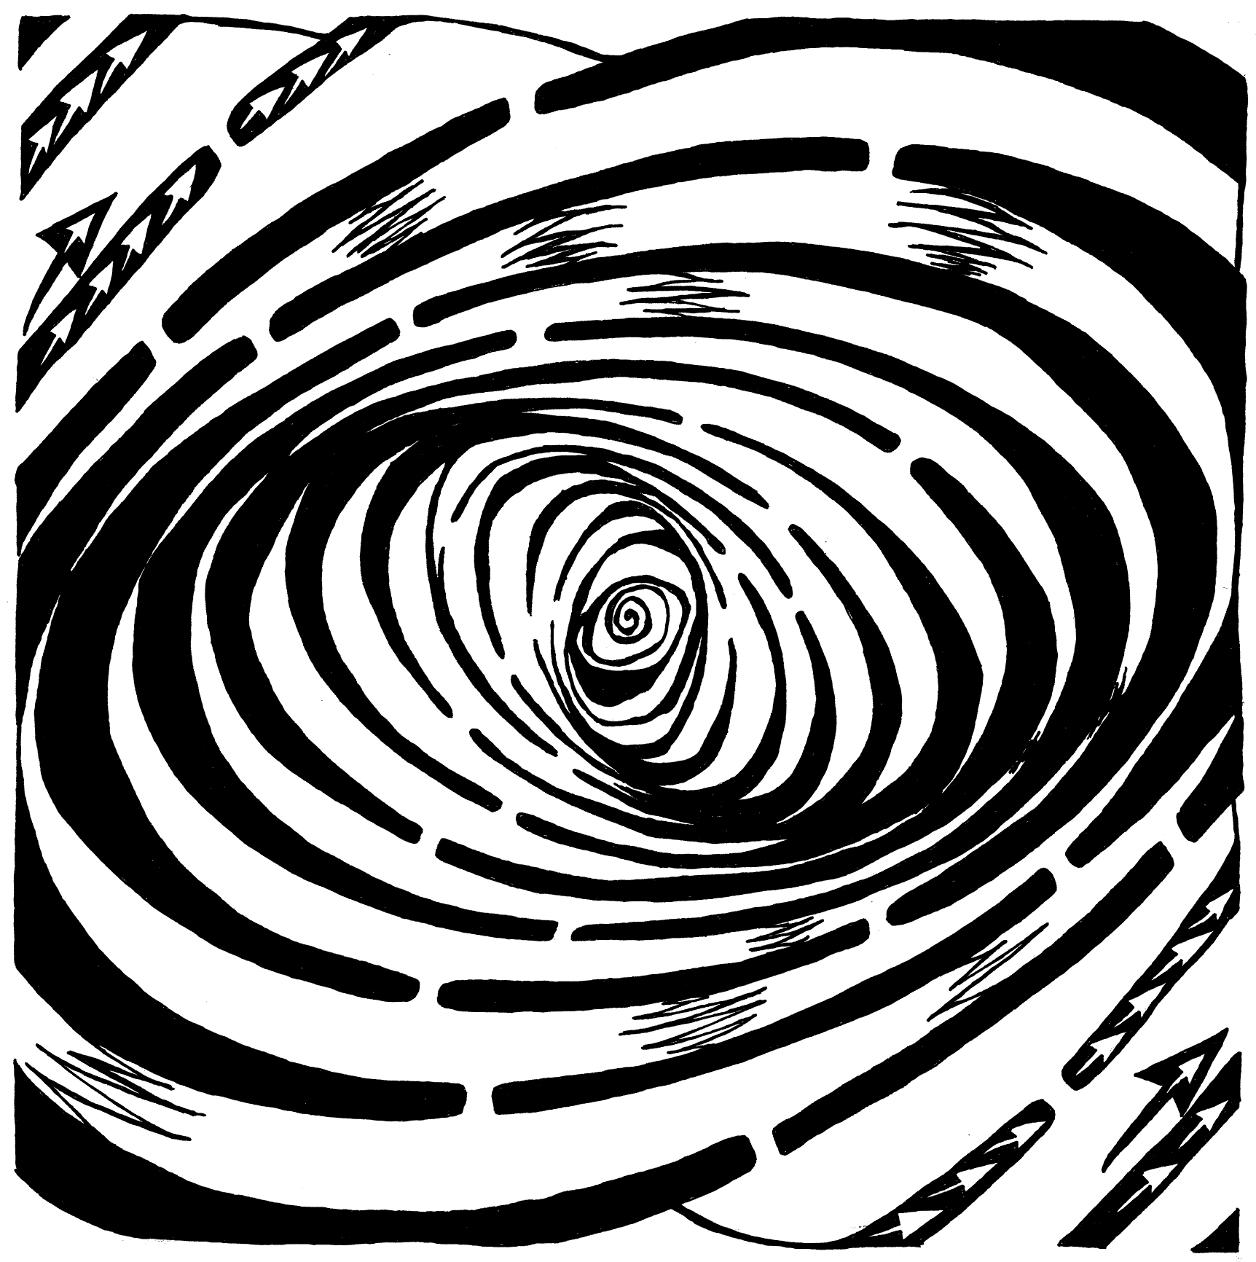 Wave Swirled Maze